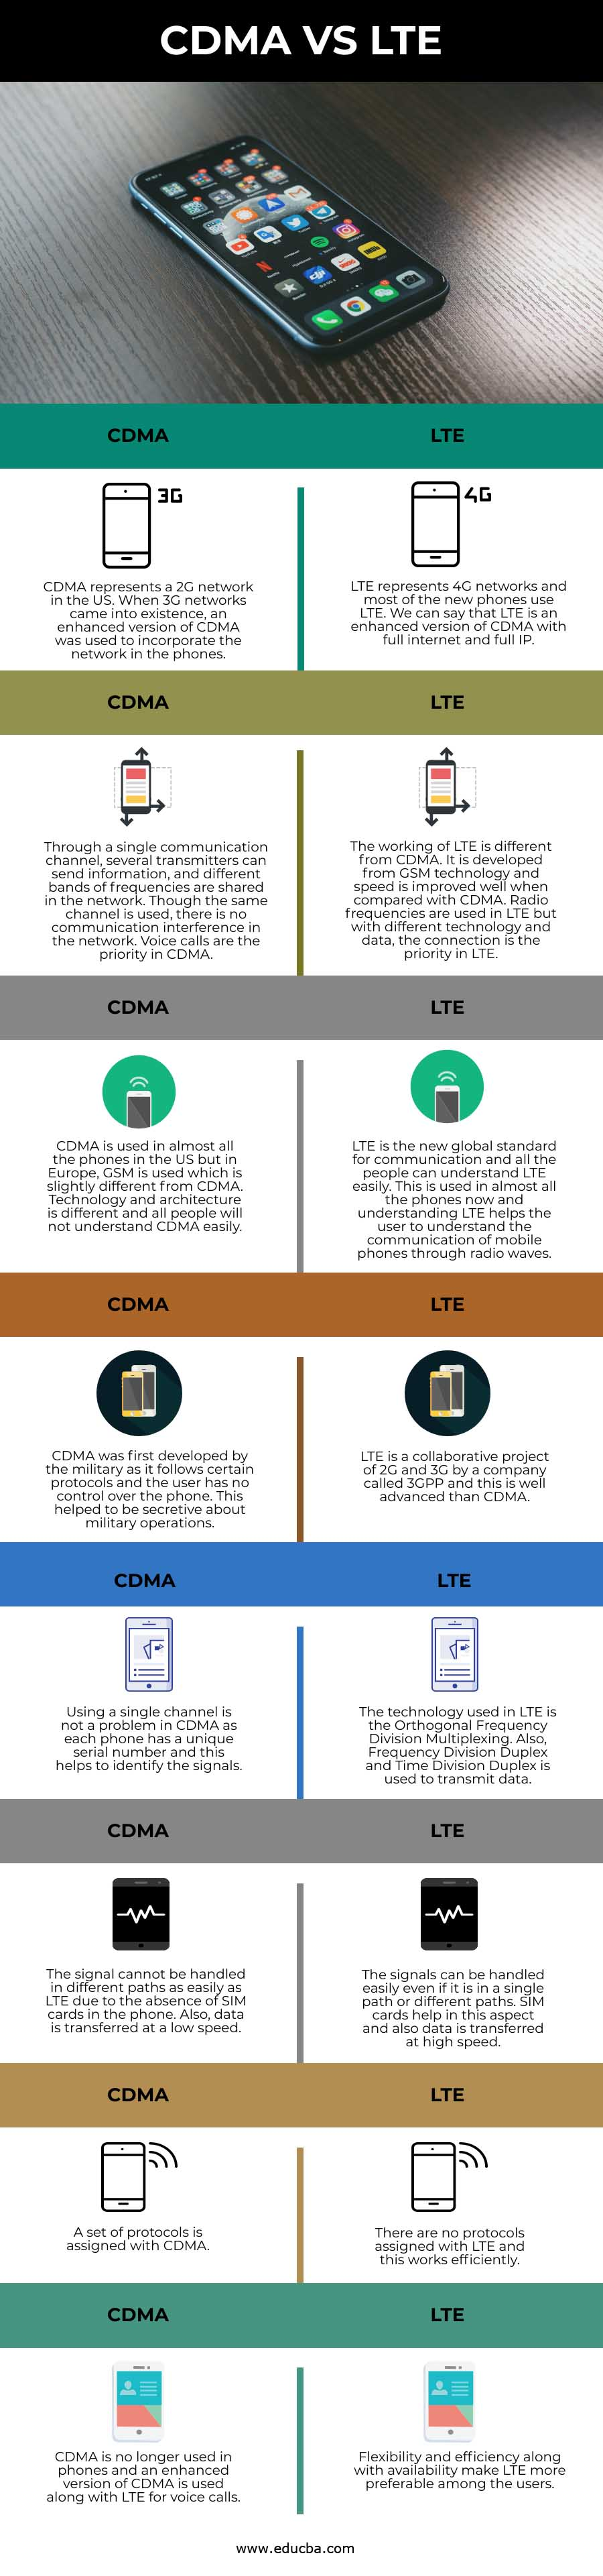 CDMA VS LTE info